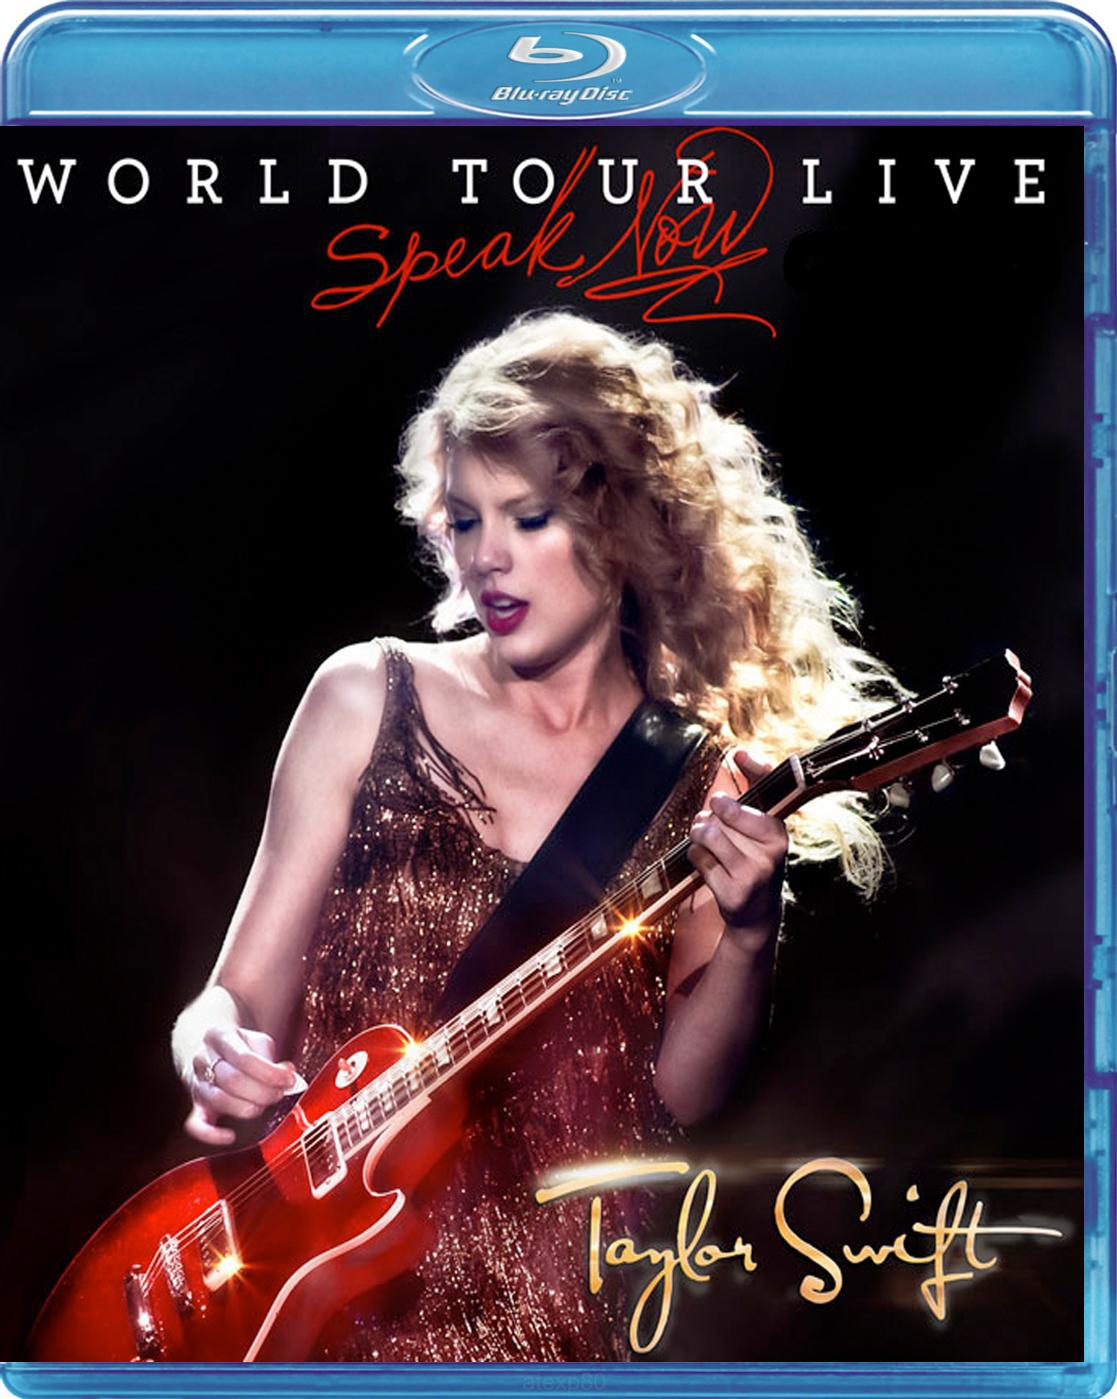 Taylor Swift Speak Now Album Download | beta pics